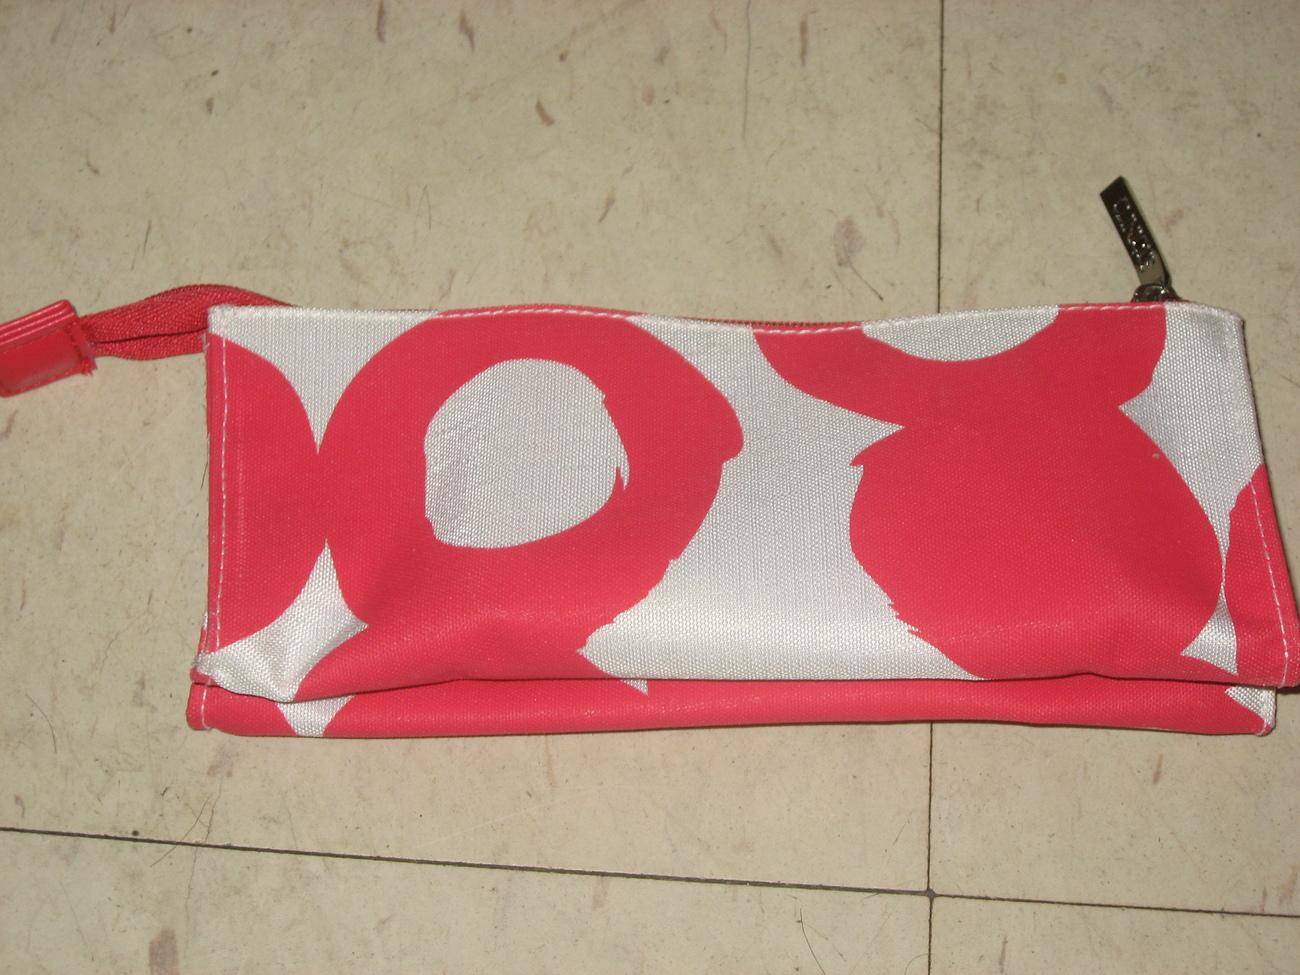 Clinique Red White Makeup bag - $2.99